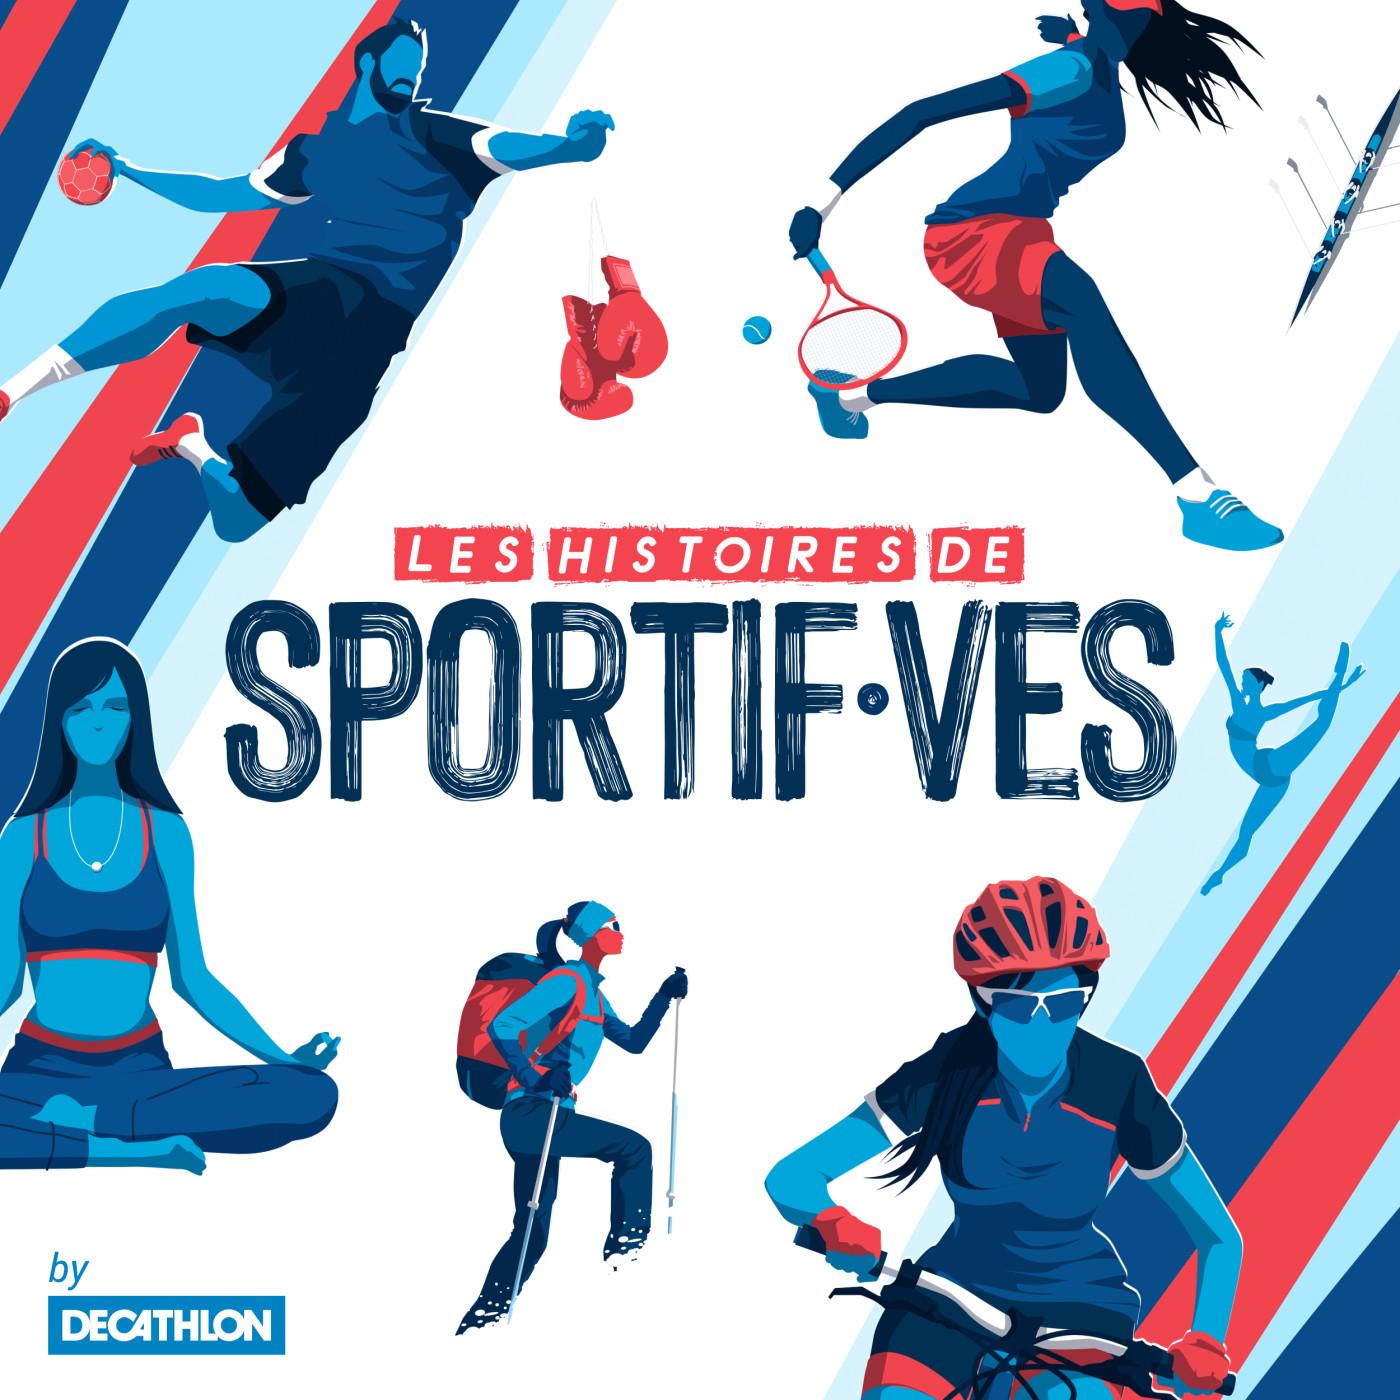 Les Histoires de Sportif·ves by Decathlon.